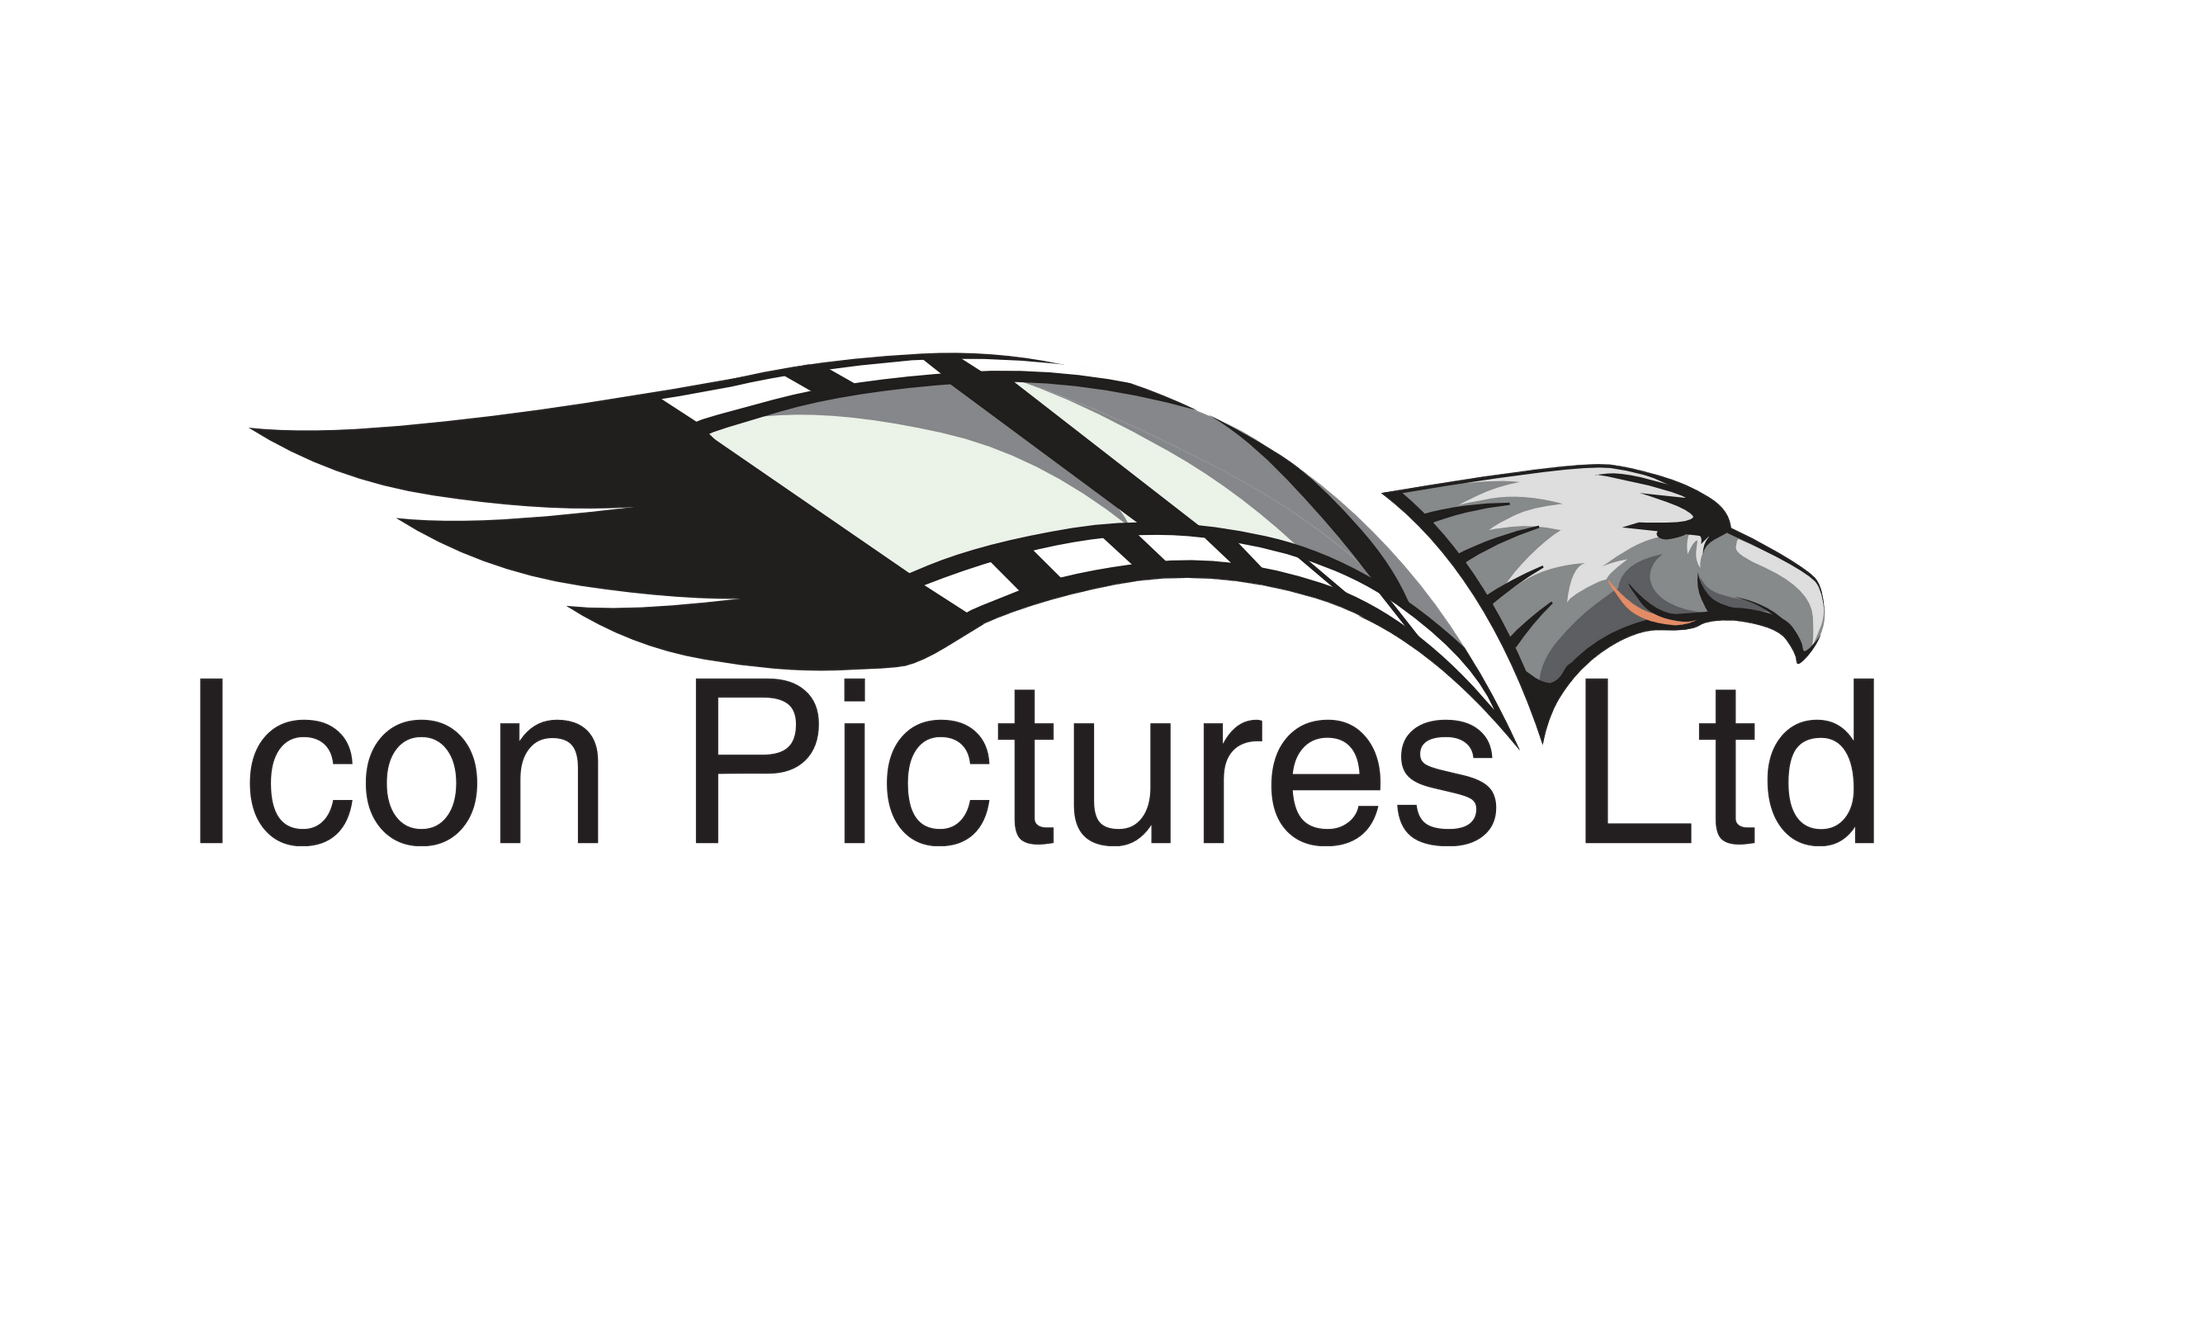 Film, TV and Video Production Company. Leeds, United Kingdom